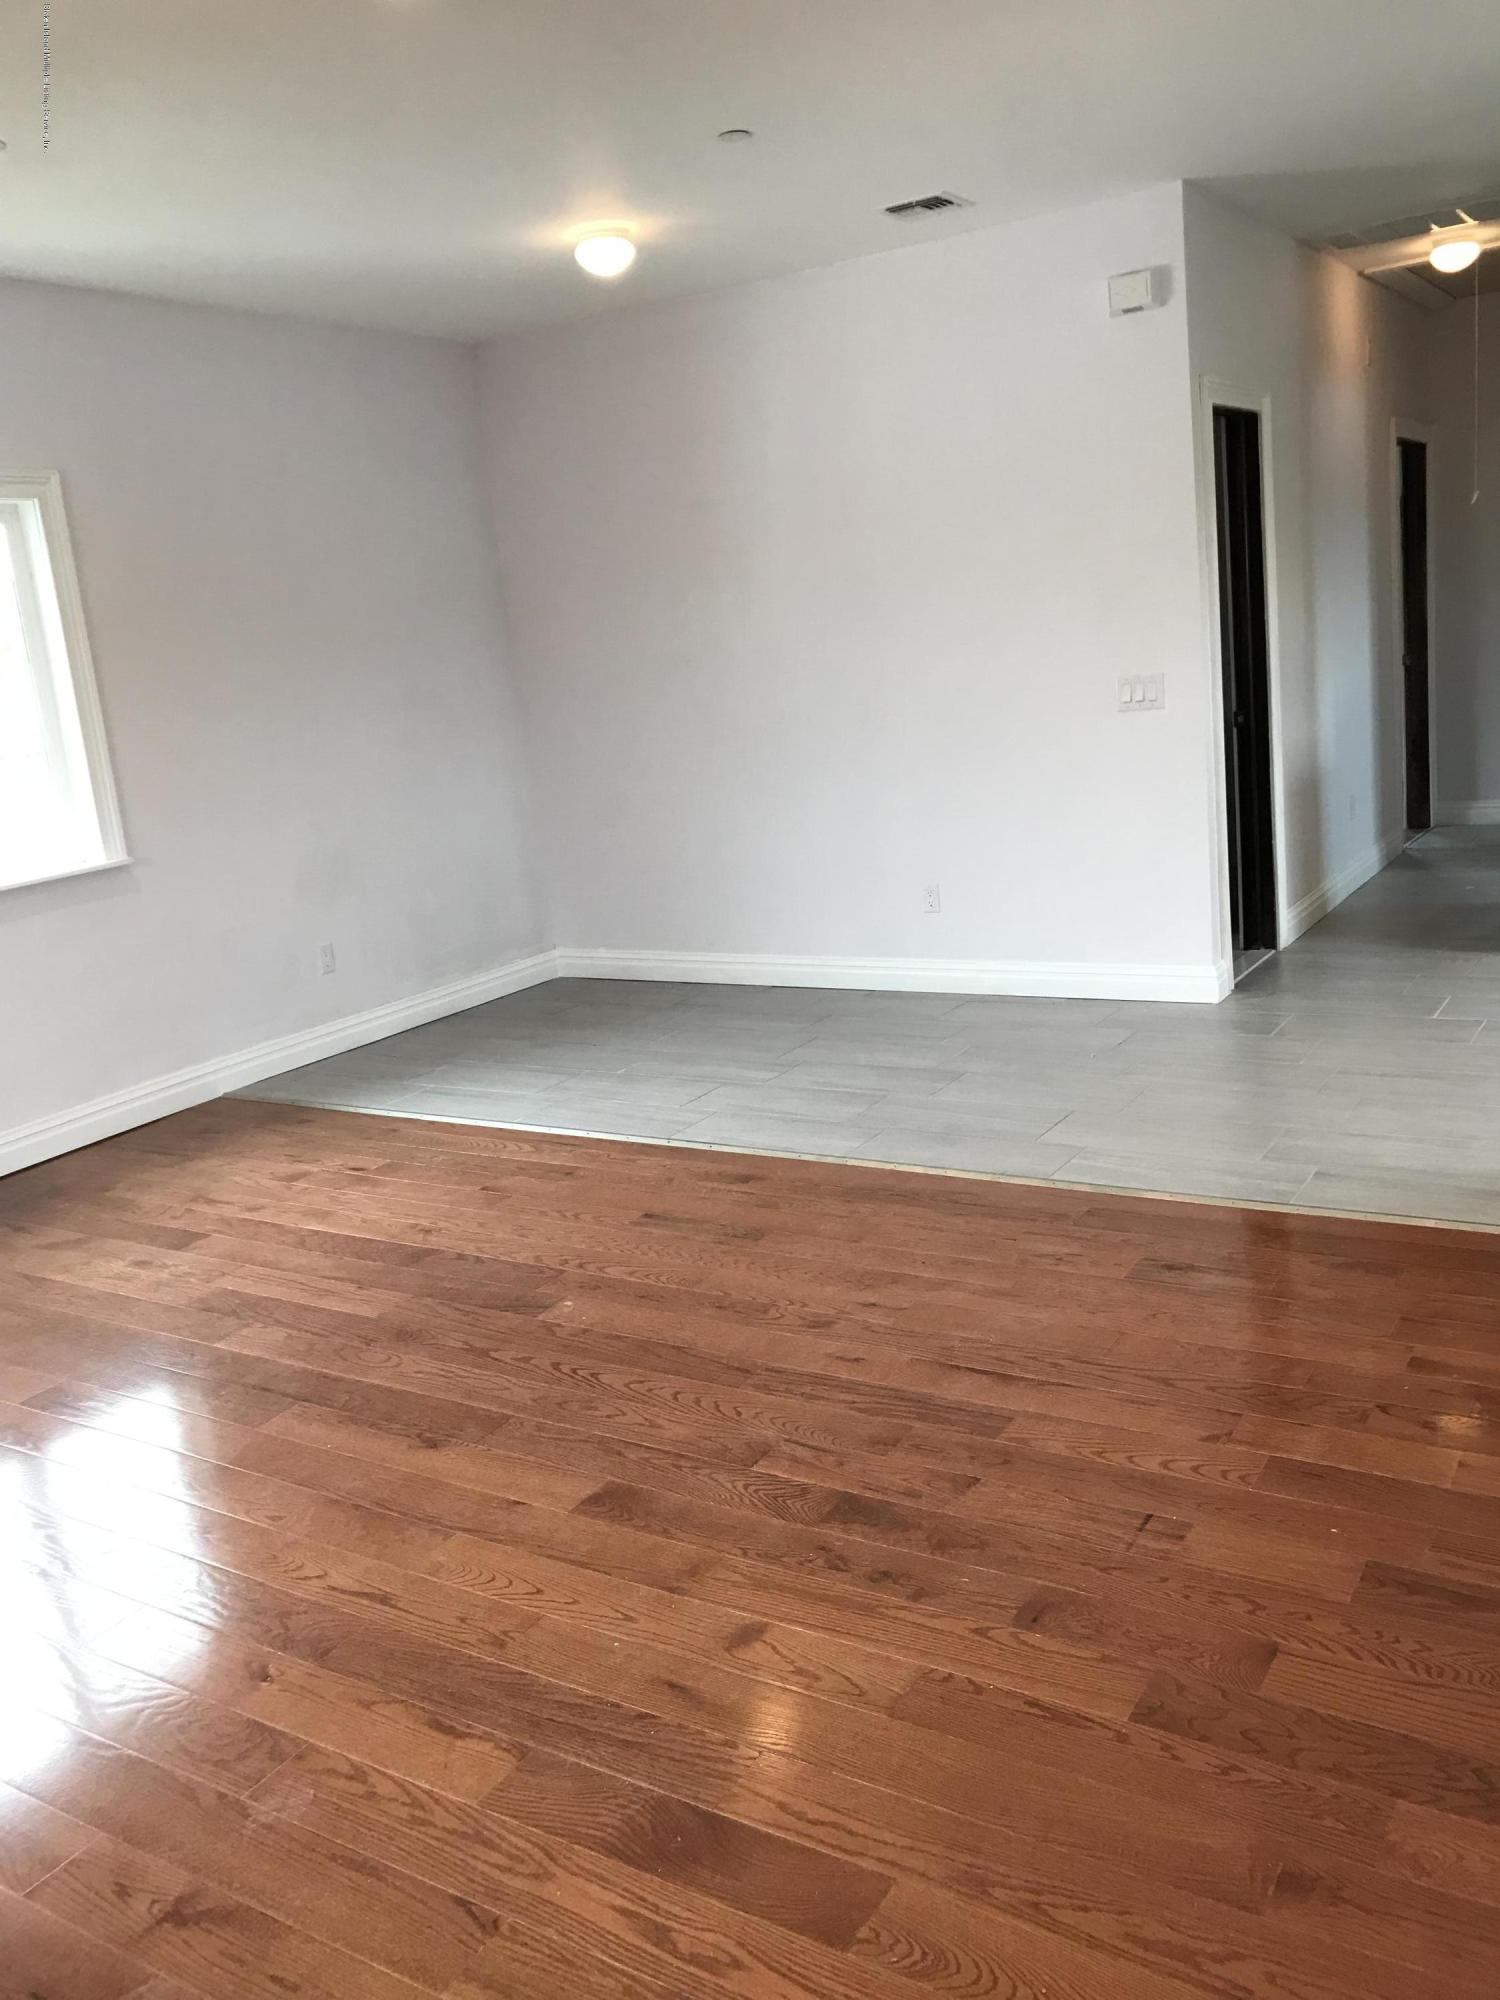 Two Family - Detached 120 Pemberton Avenue  Staten Island, NY 10308, MLS-1124929-22